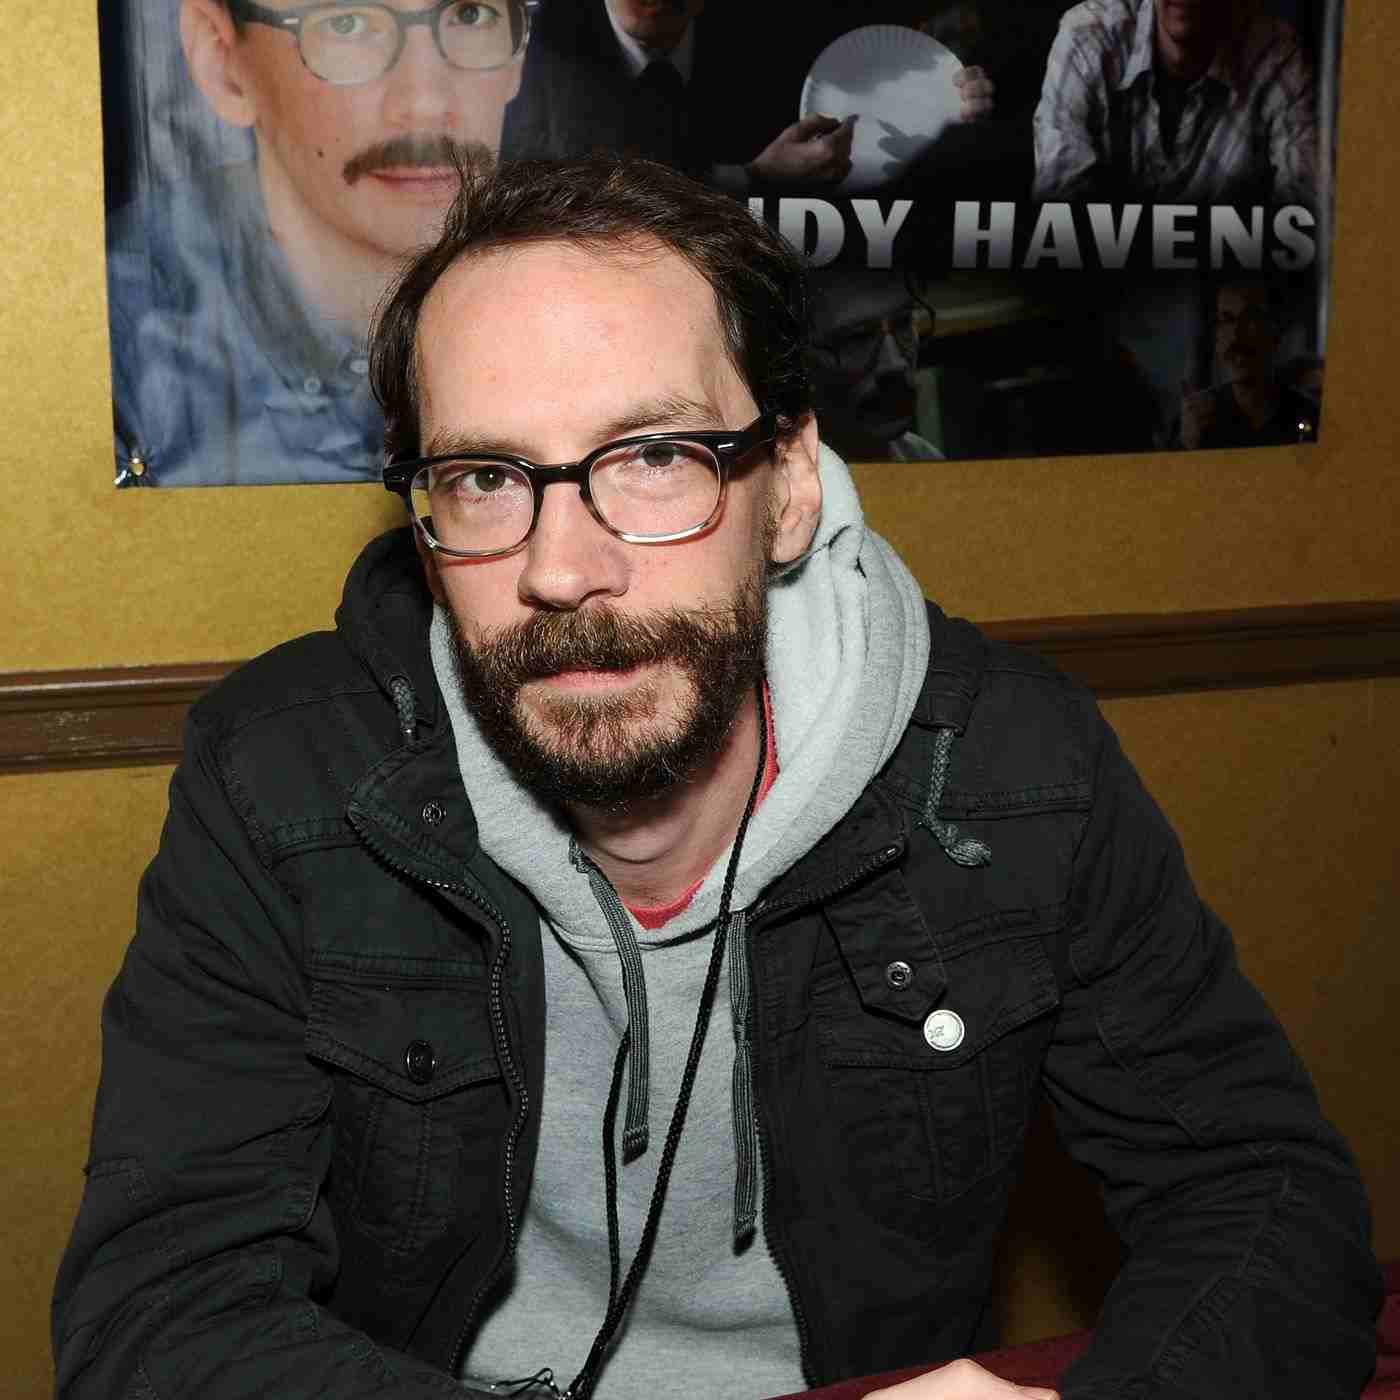 Randy Havens